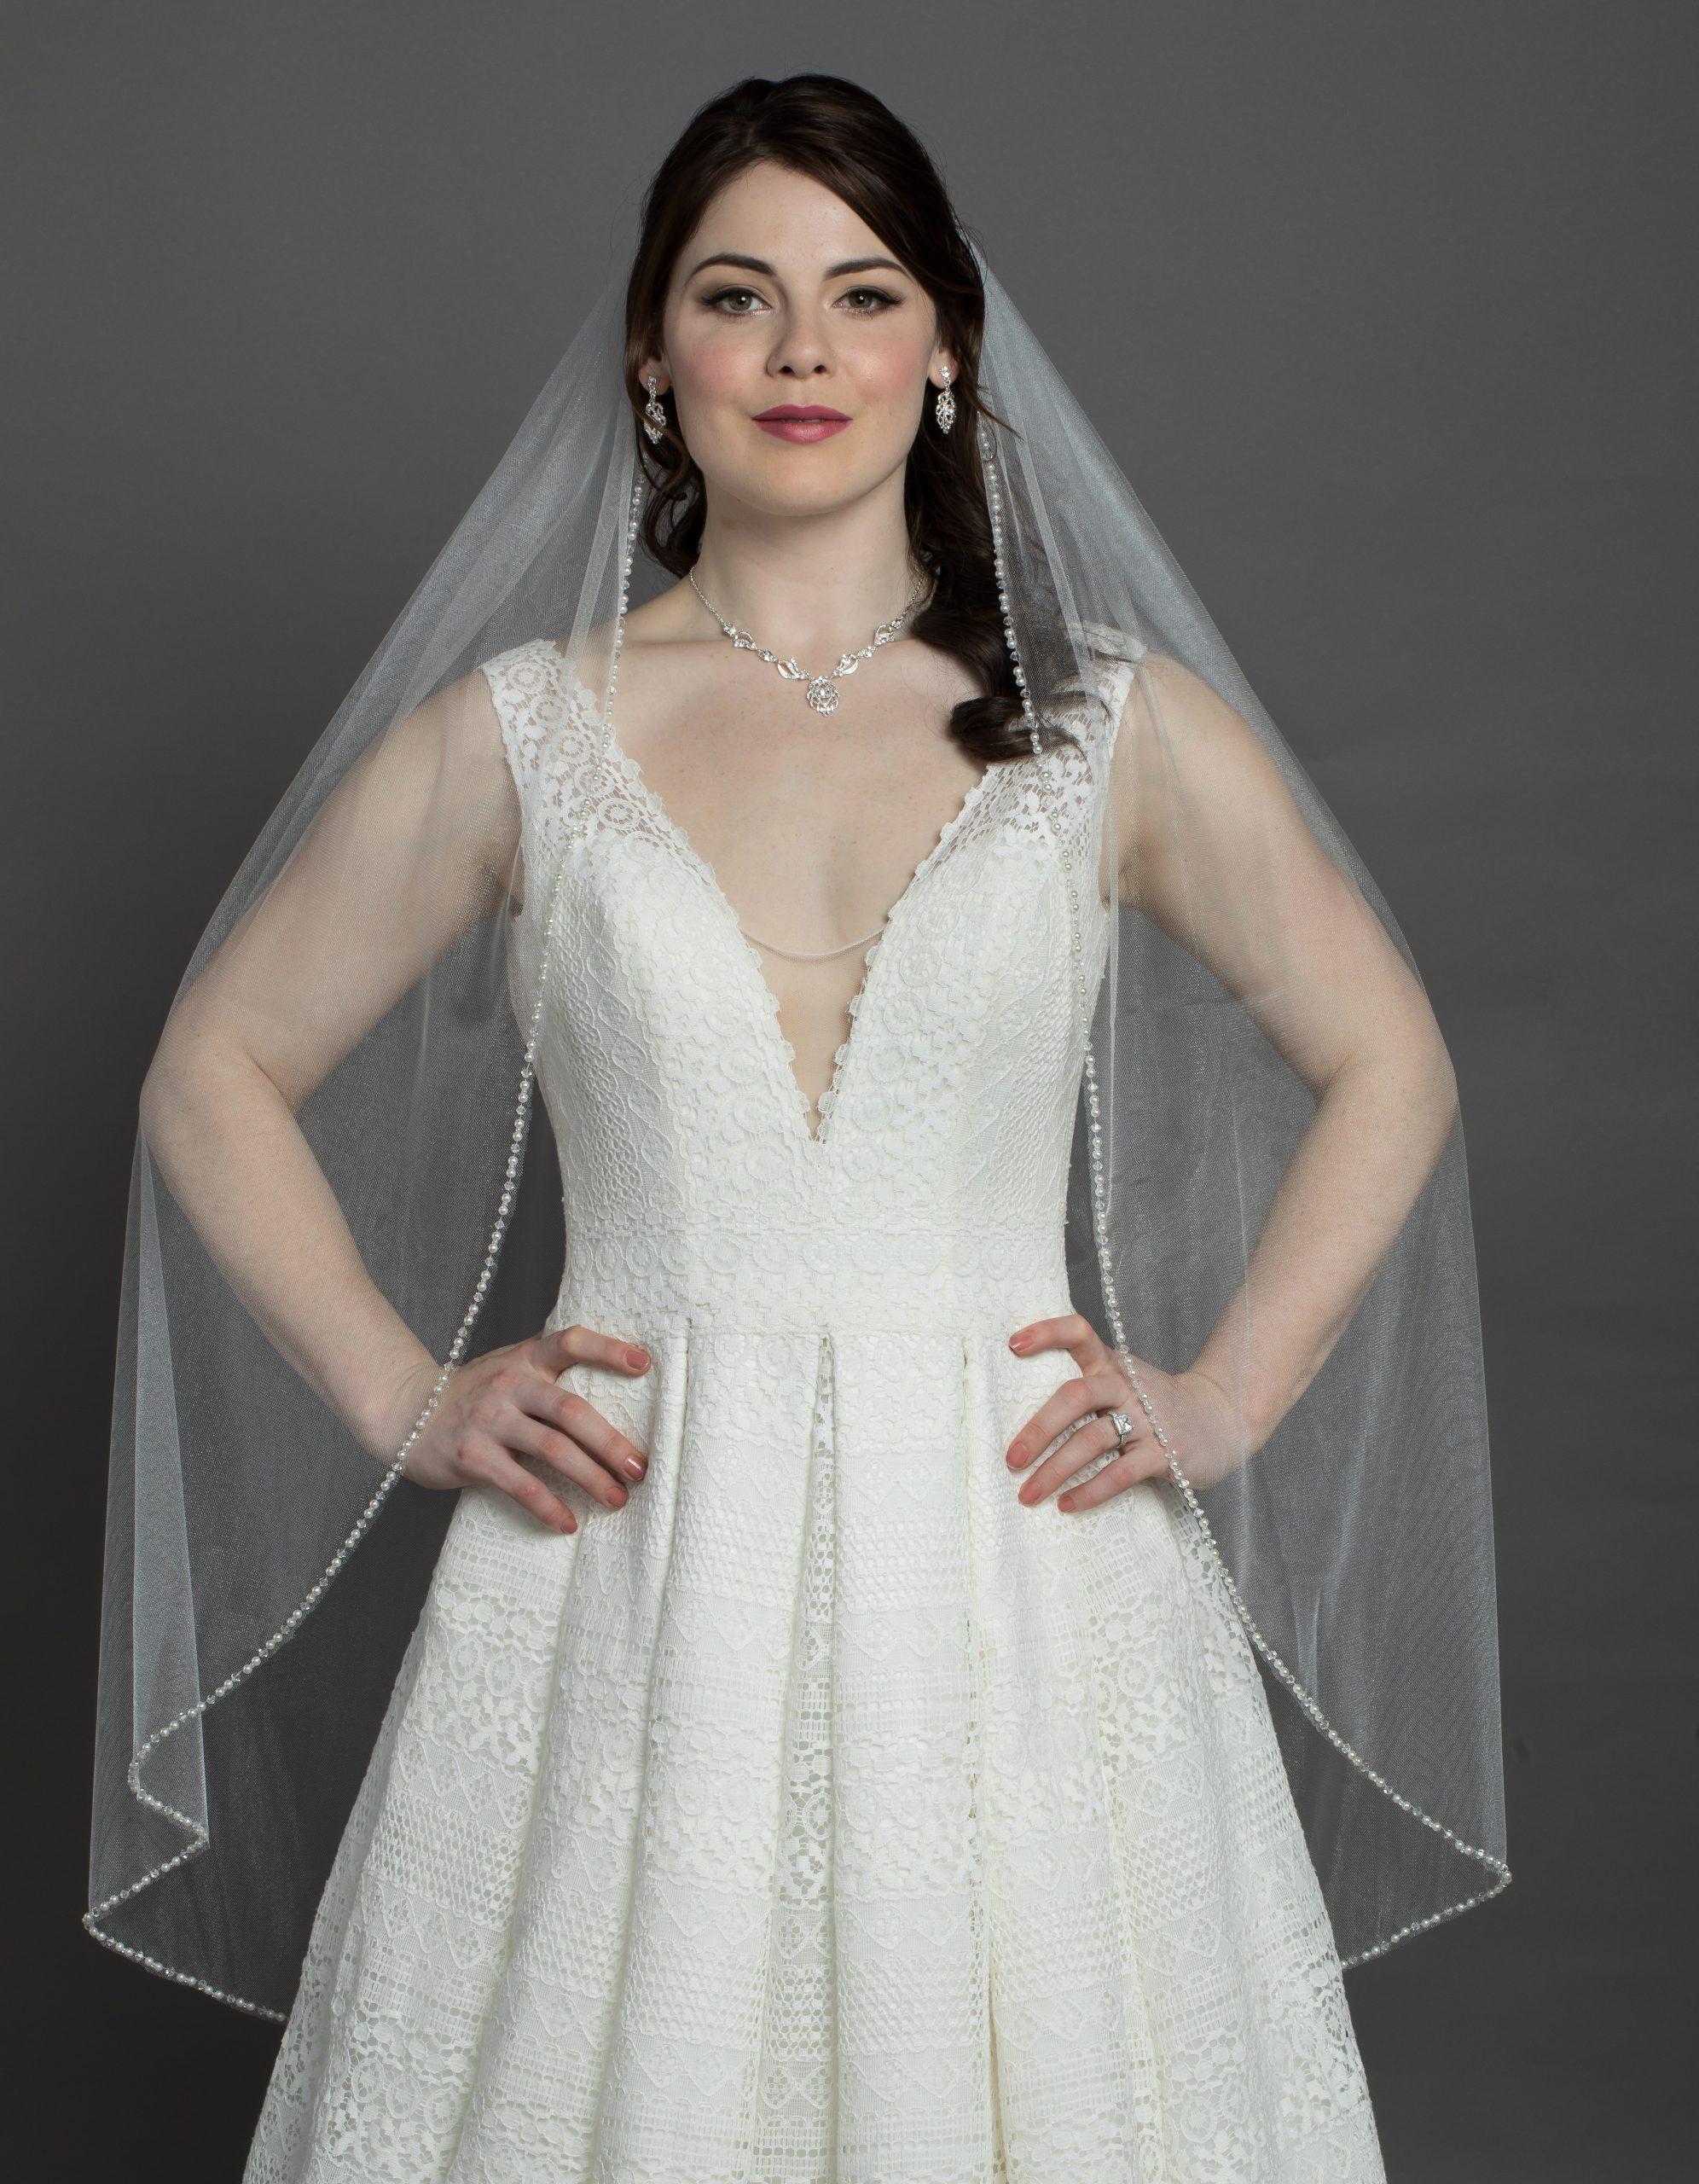 Bridal Classics Marquise Veils MV-2469